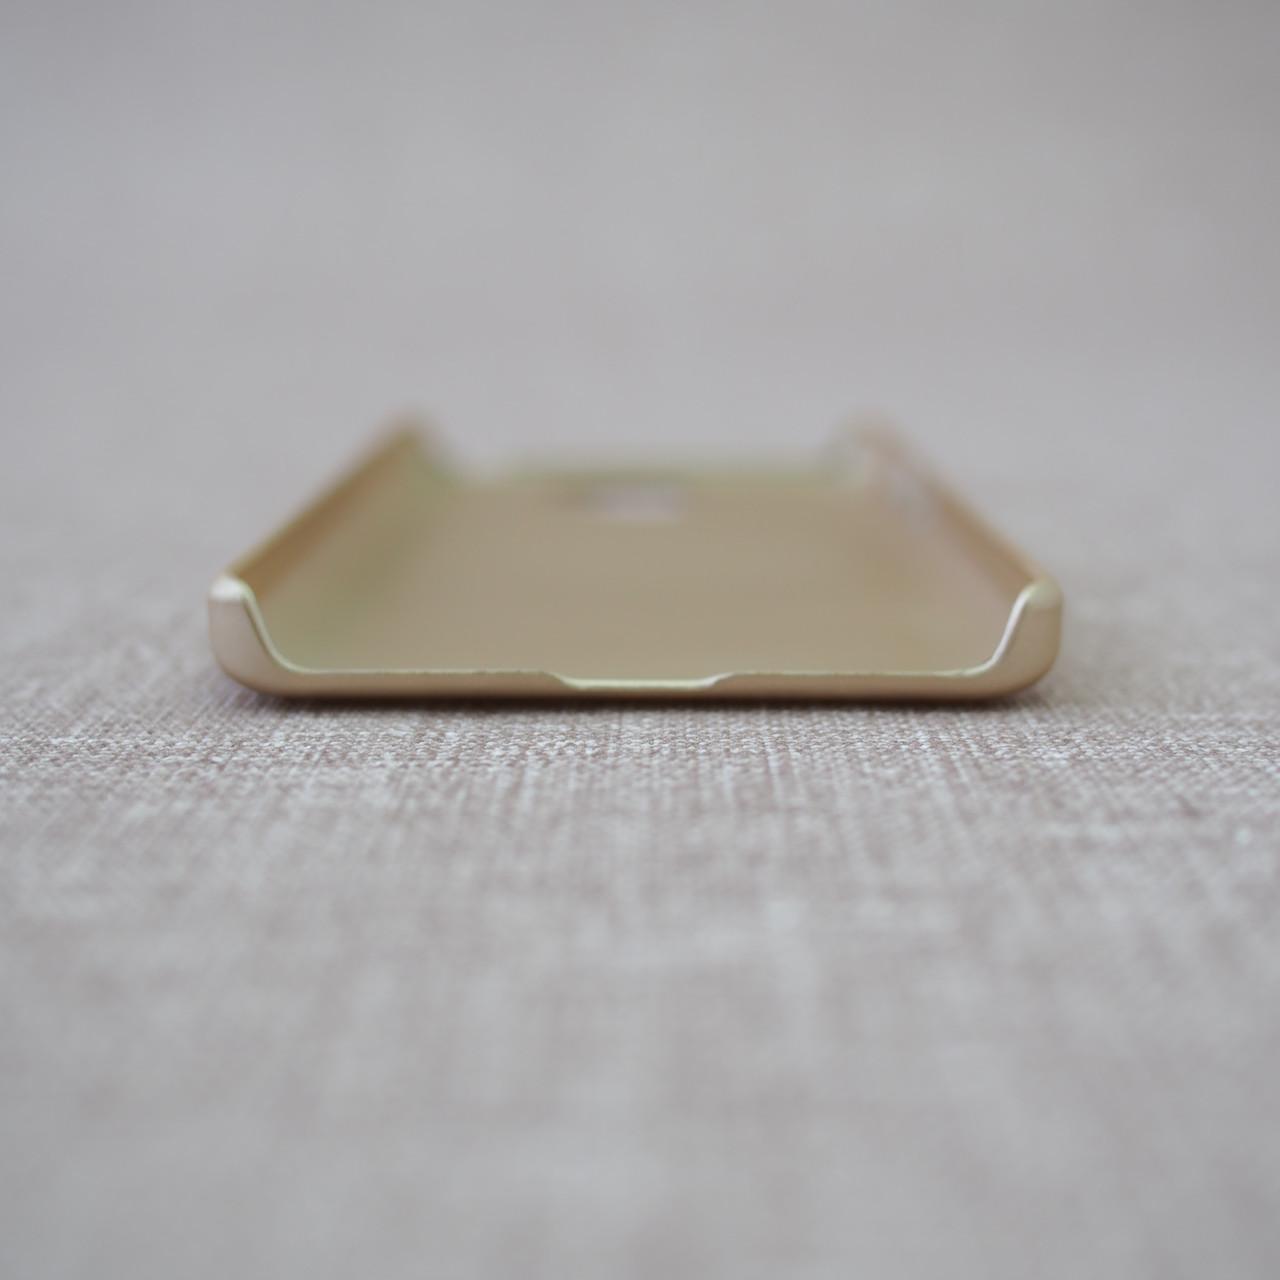 Чехлы для Xiaomi Redmi 4 Nillkin Super Frosted Shield gold Для телефона